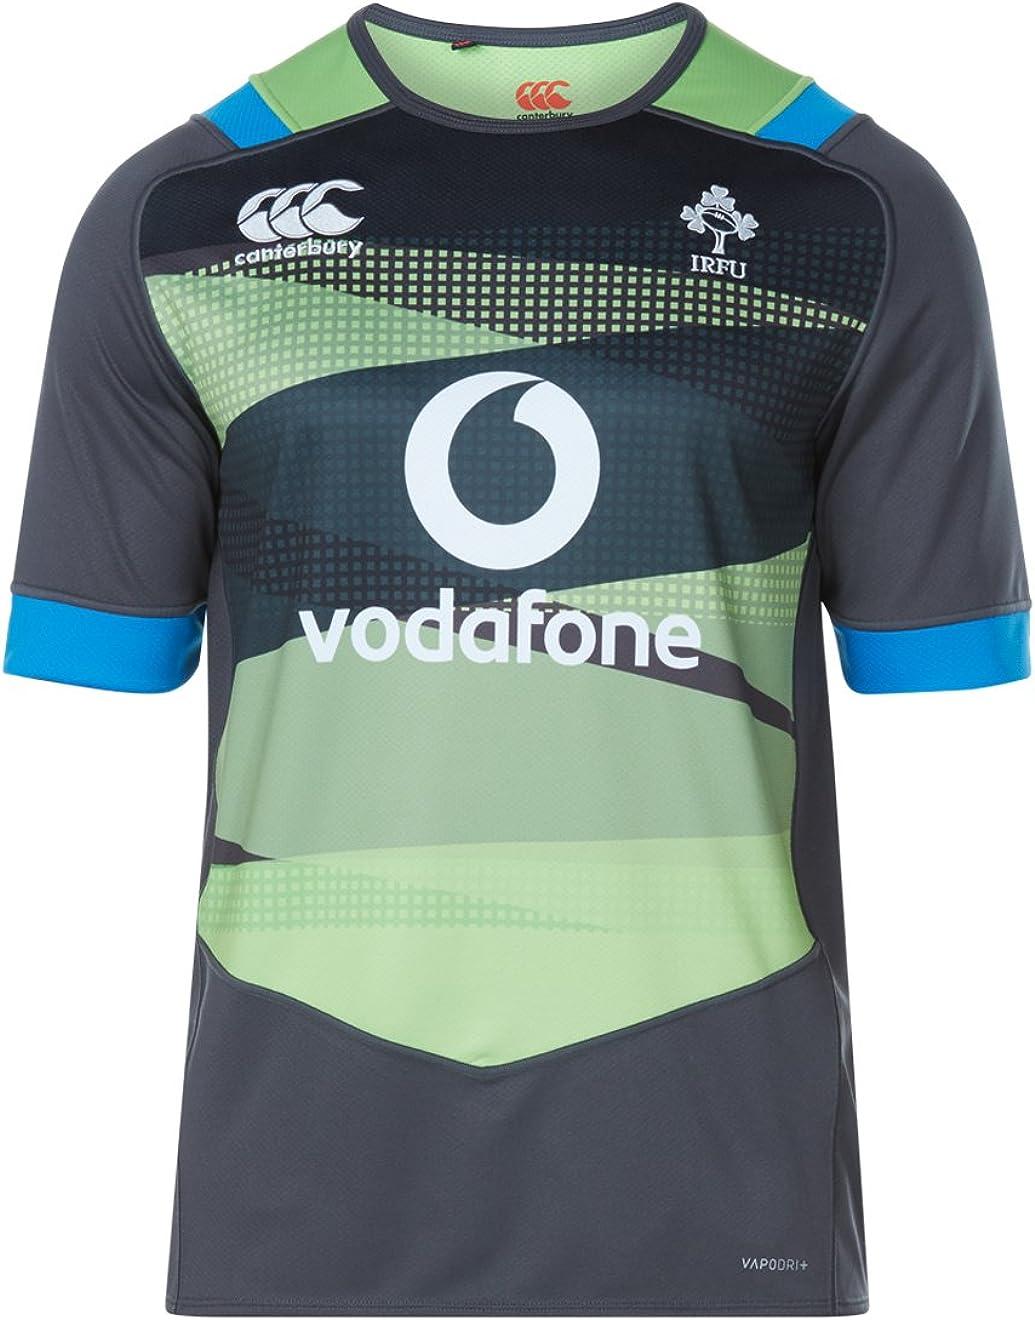 Official IRFU Ireland Rugby Vapodri Plus Short Sleeve Training Pro Jersey, Hombre: Amazon.es: Ropa y accesorios